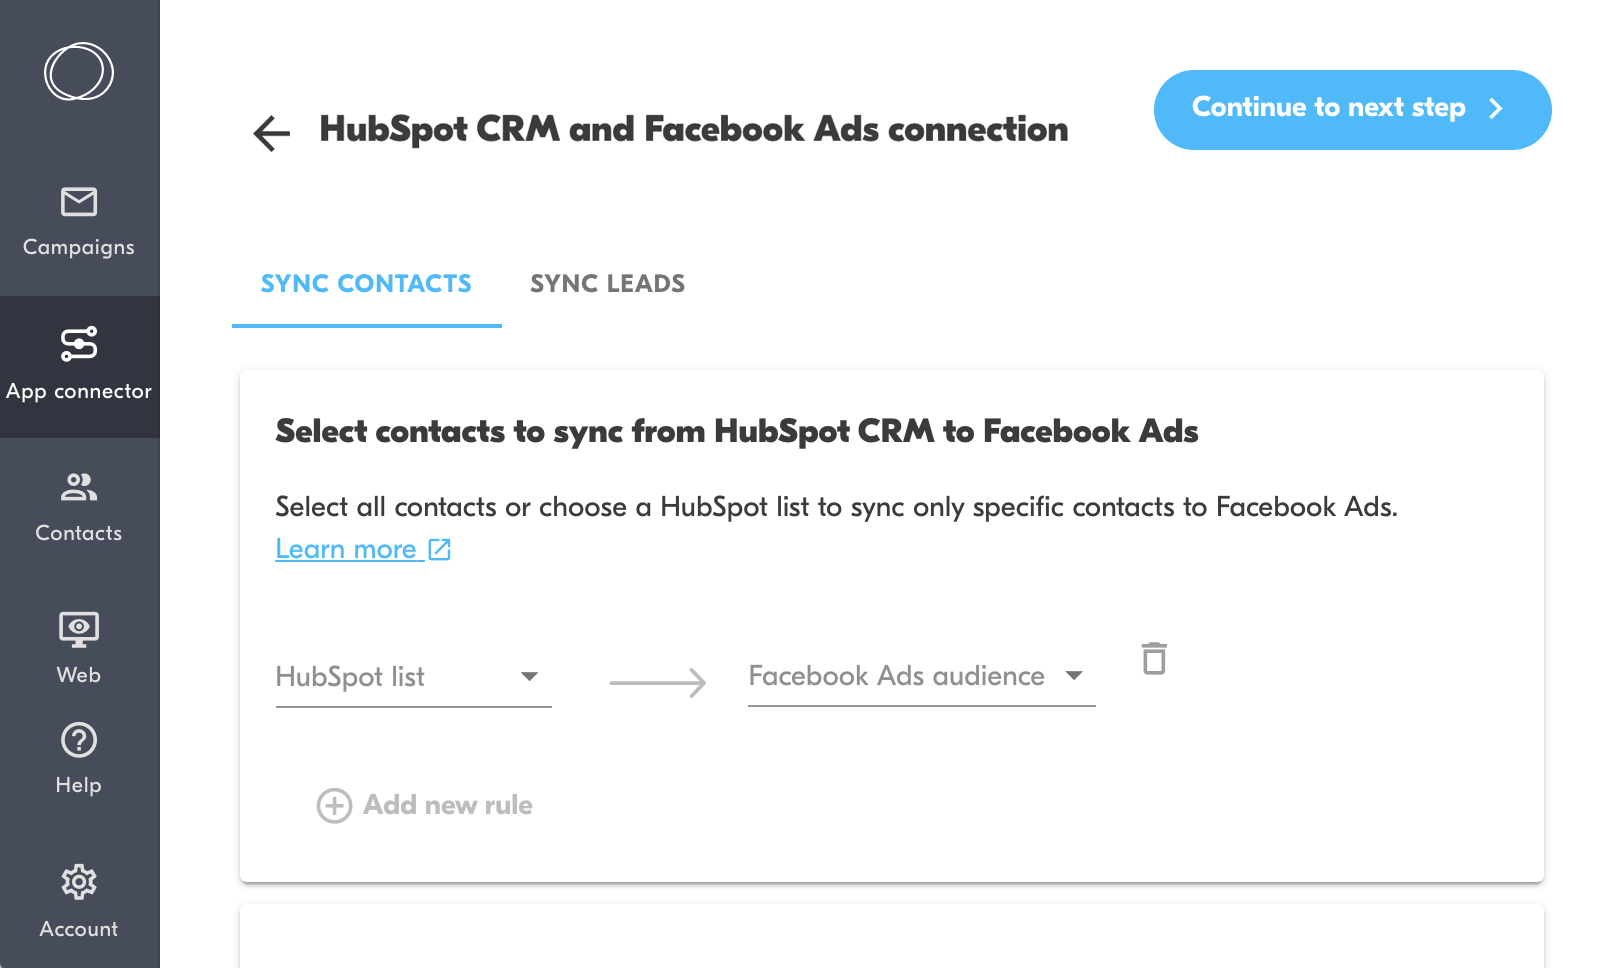 hubspot to facebook contact sync